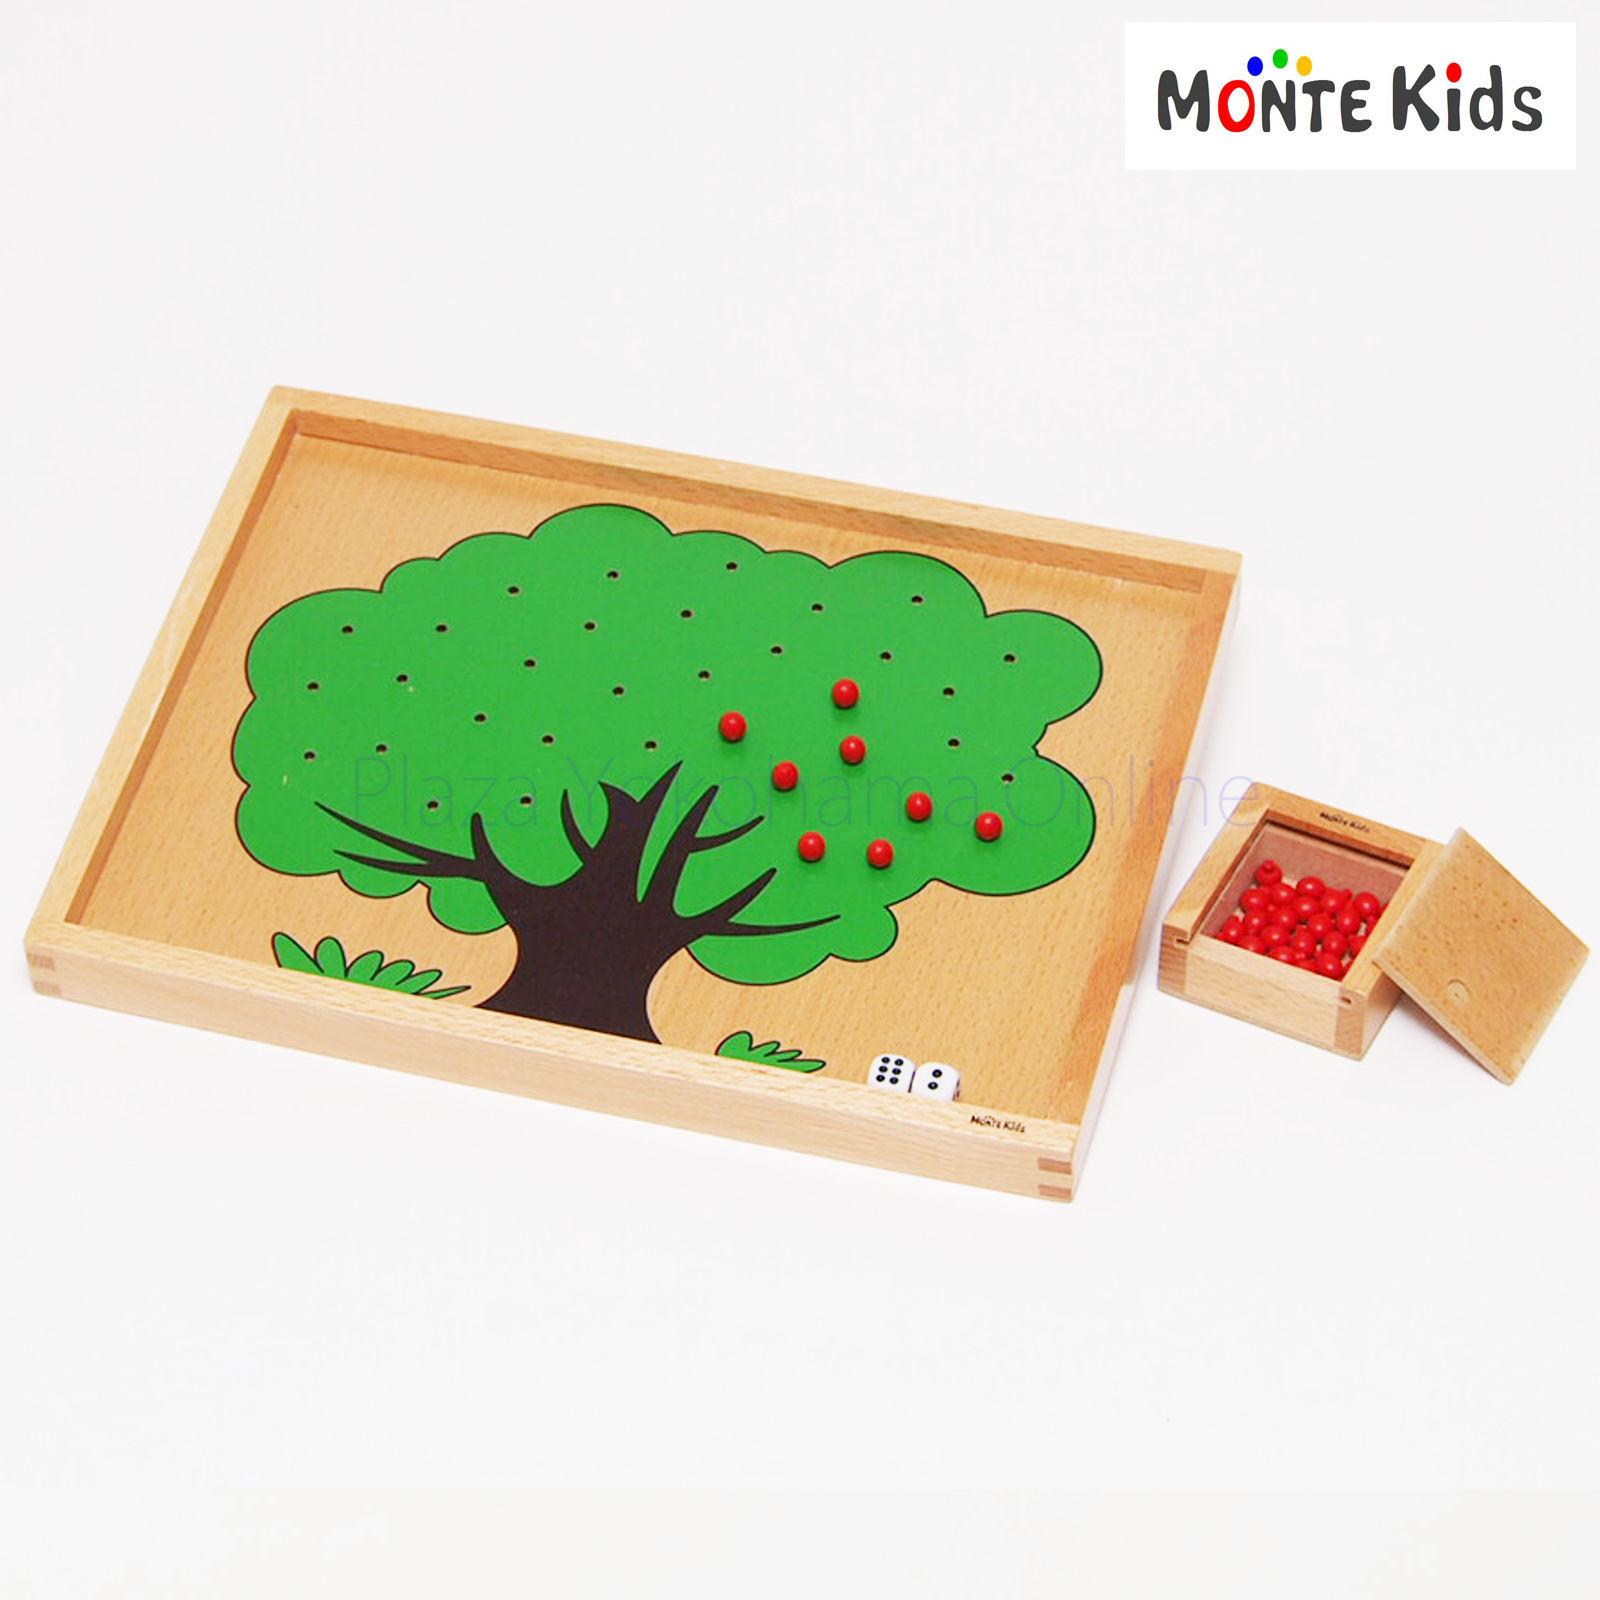 【MONTE Kids】MK-006  りんごの木  ≪OUTLET≫